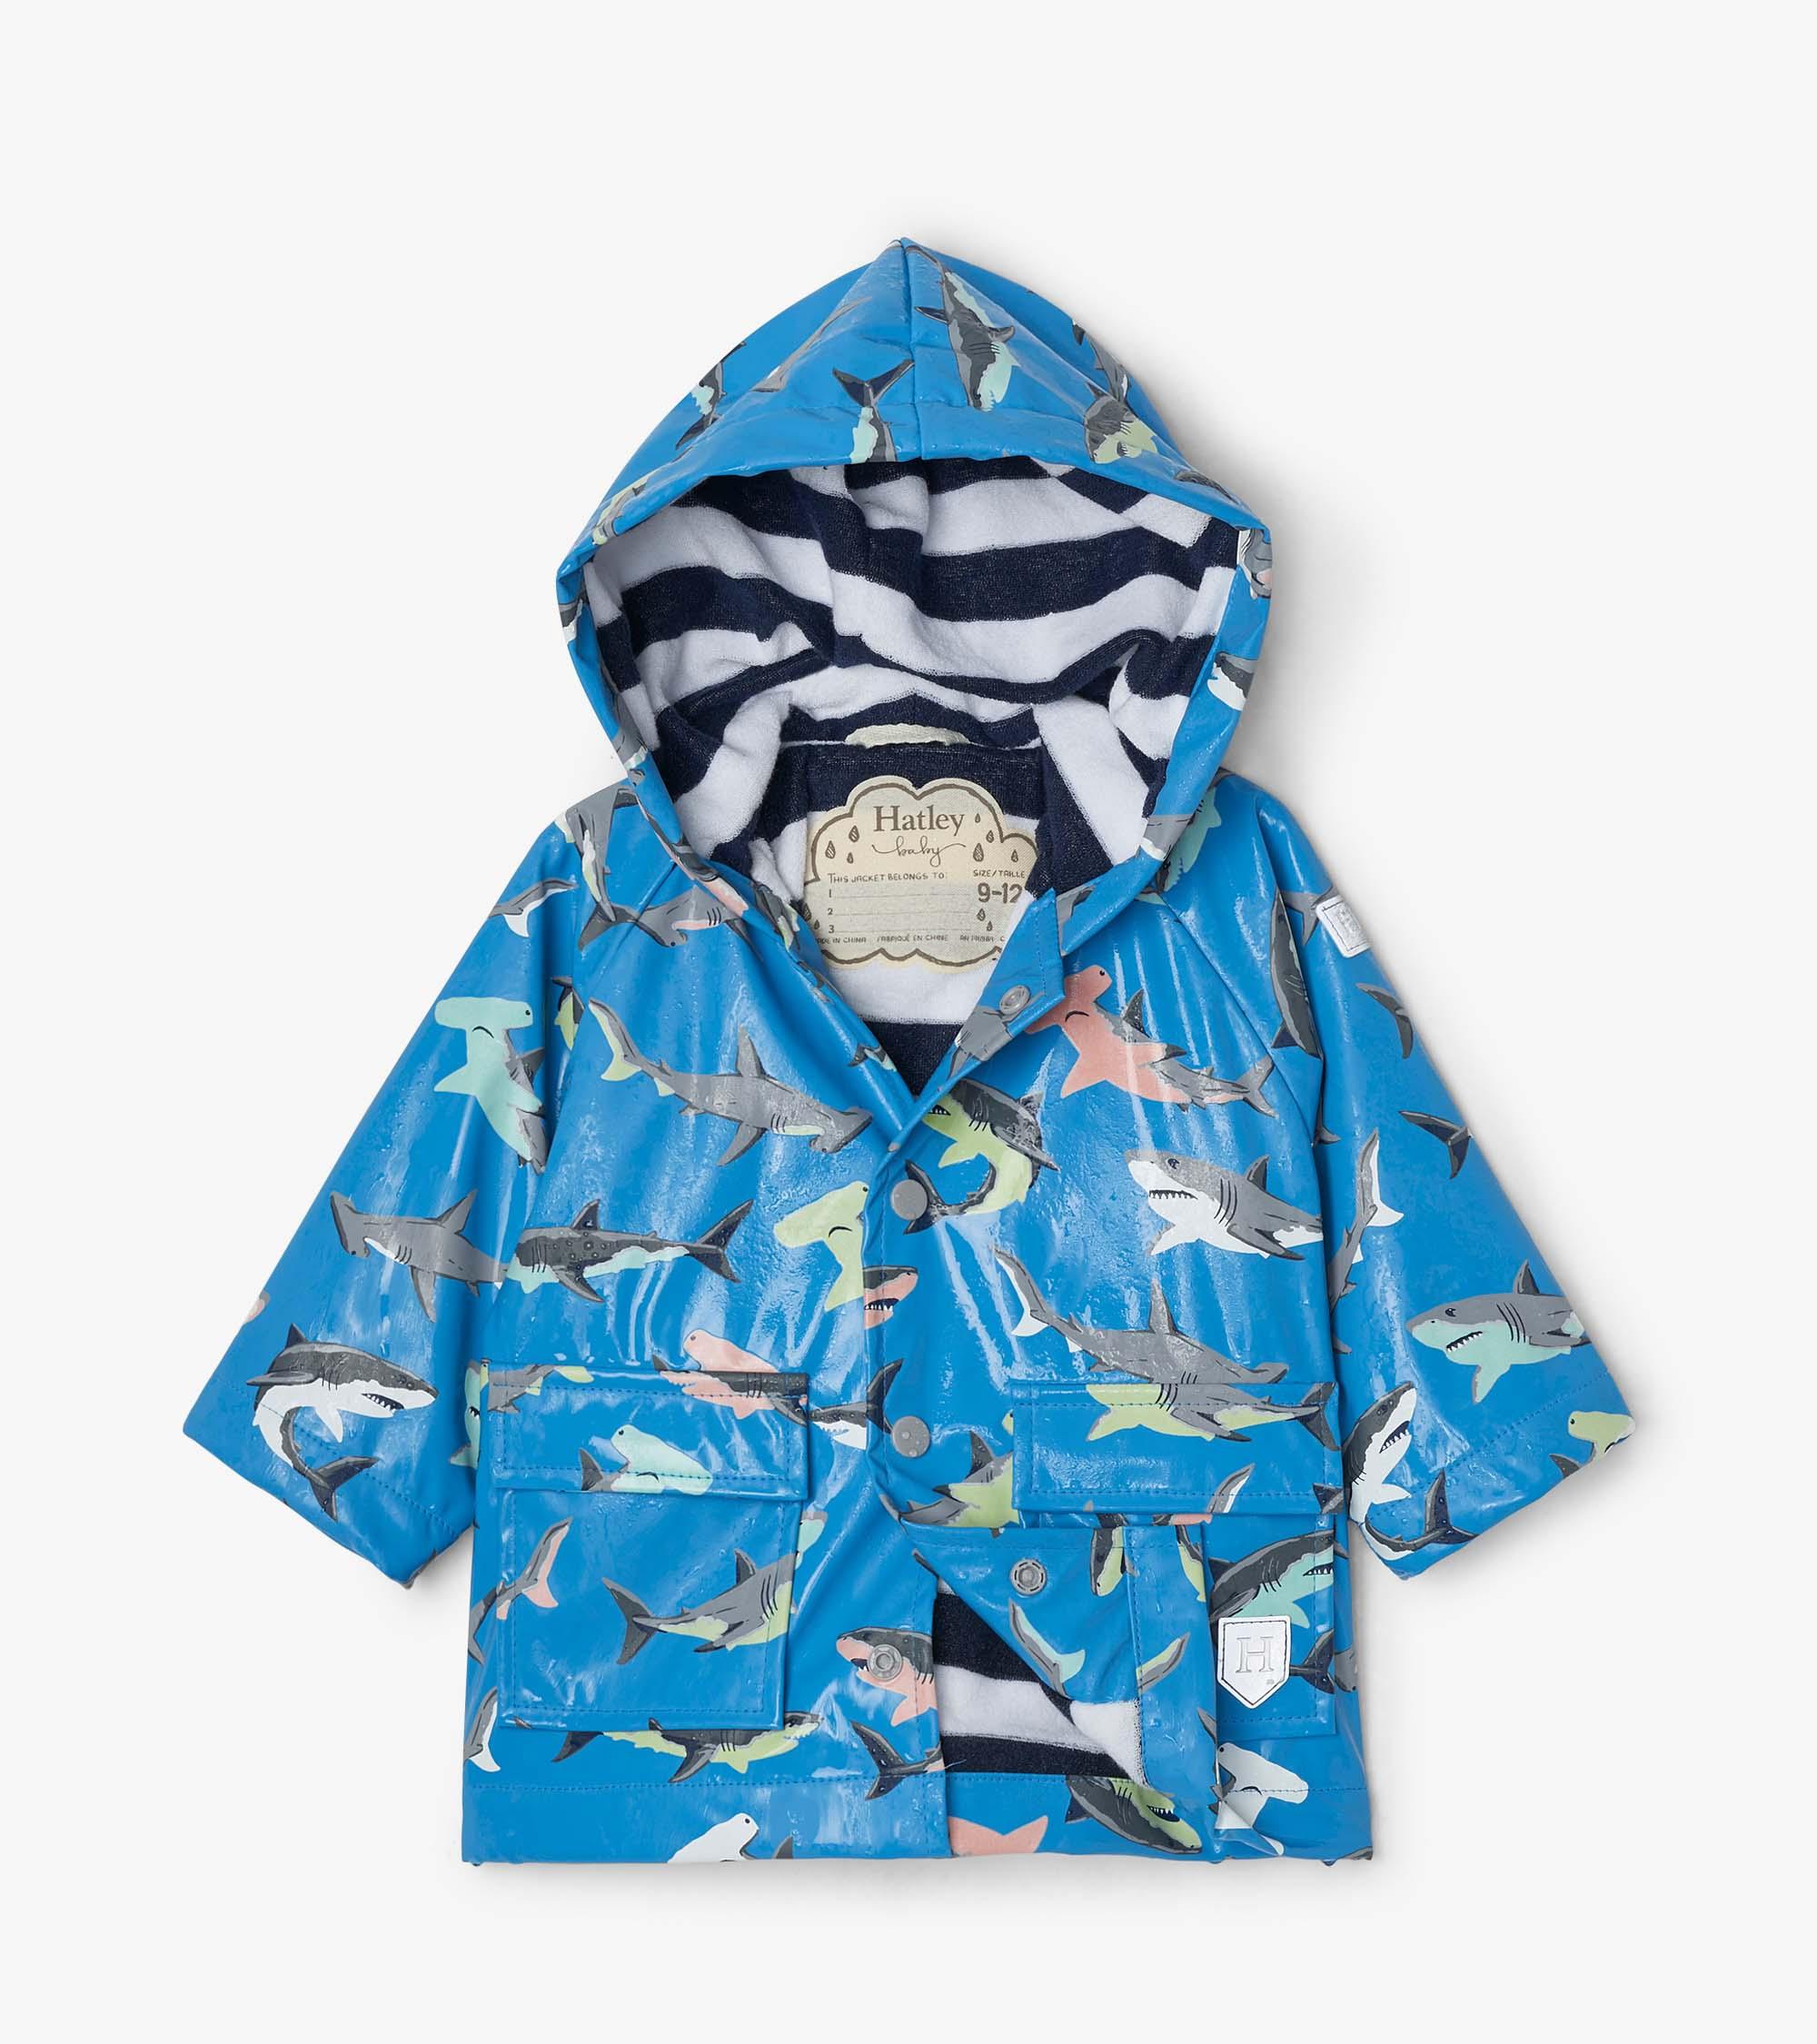 Hatley Deep-Sea Sharks Colour Changing Baby Raincoat